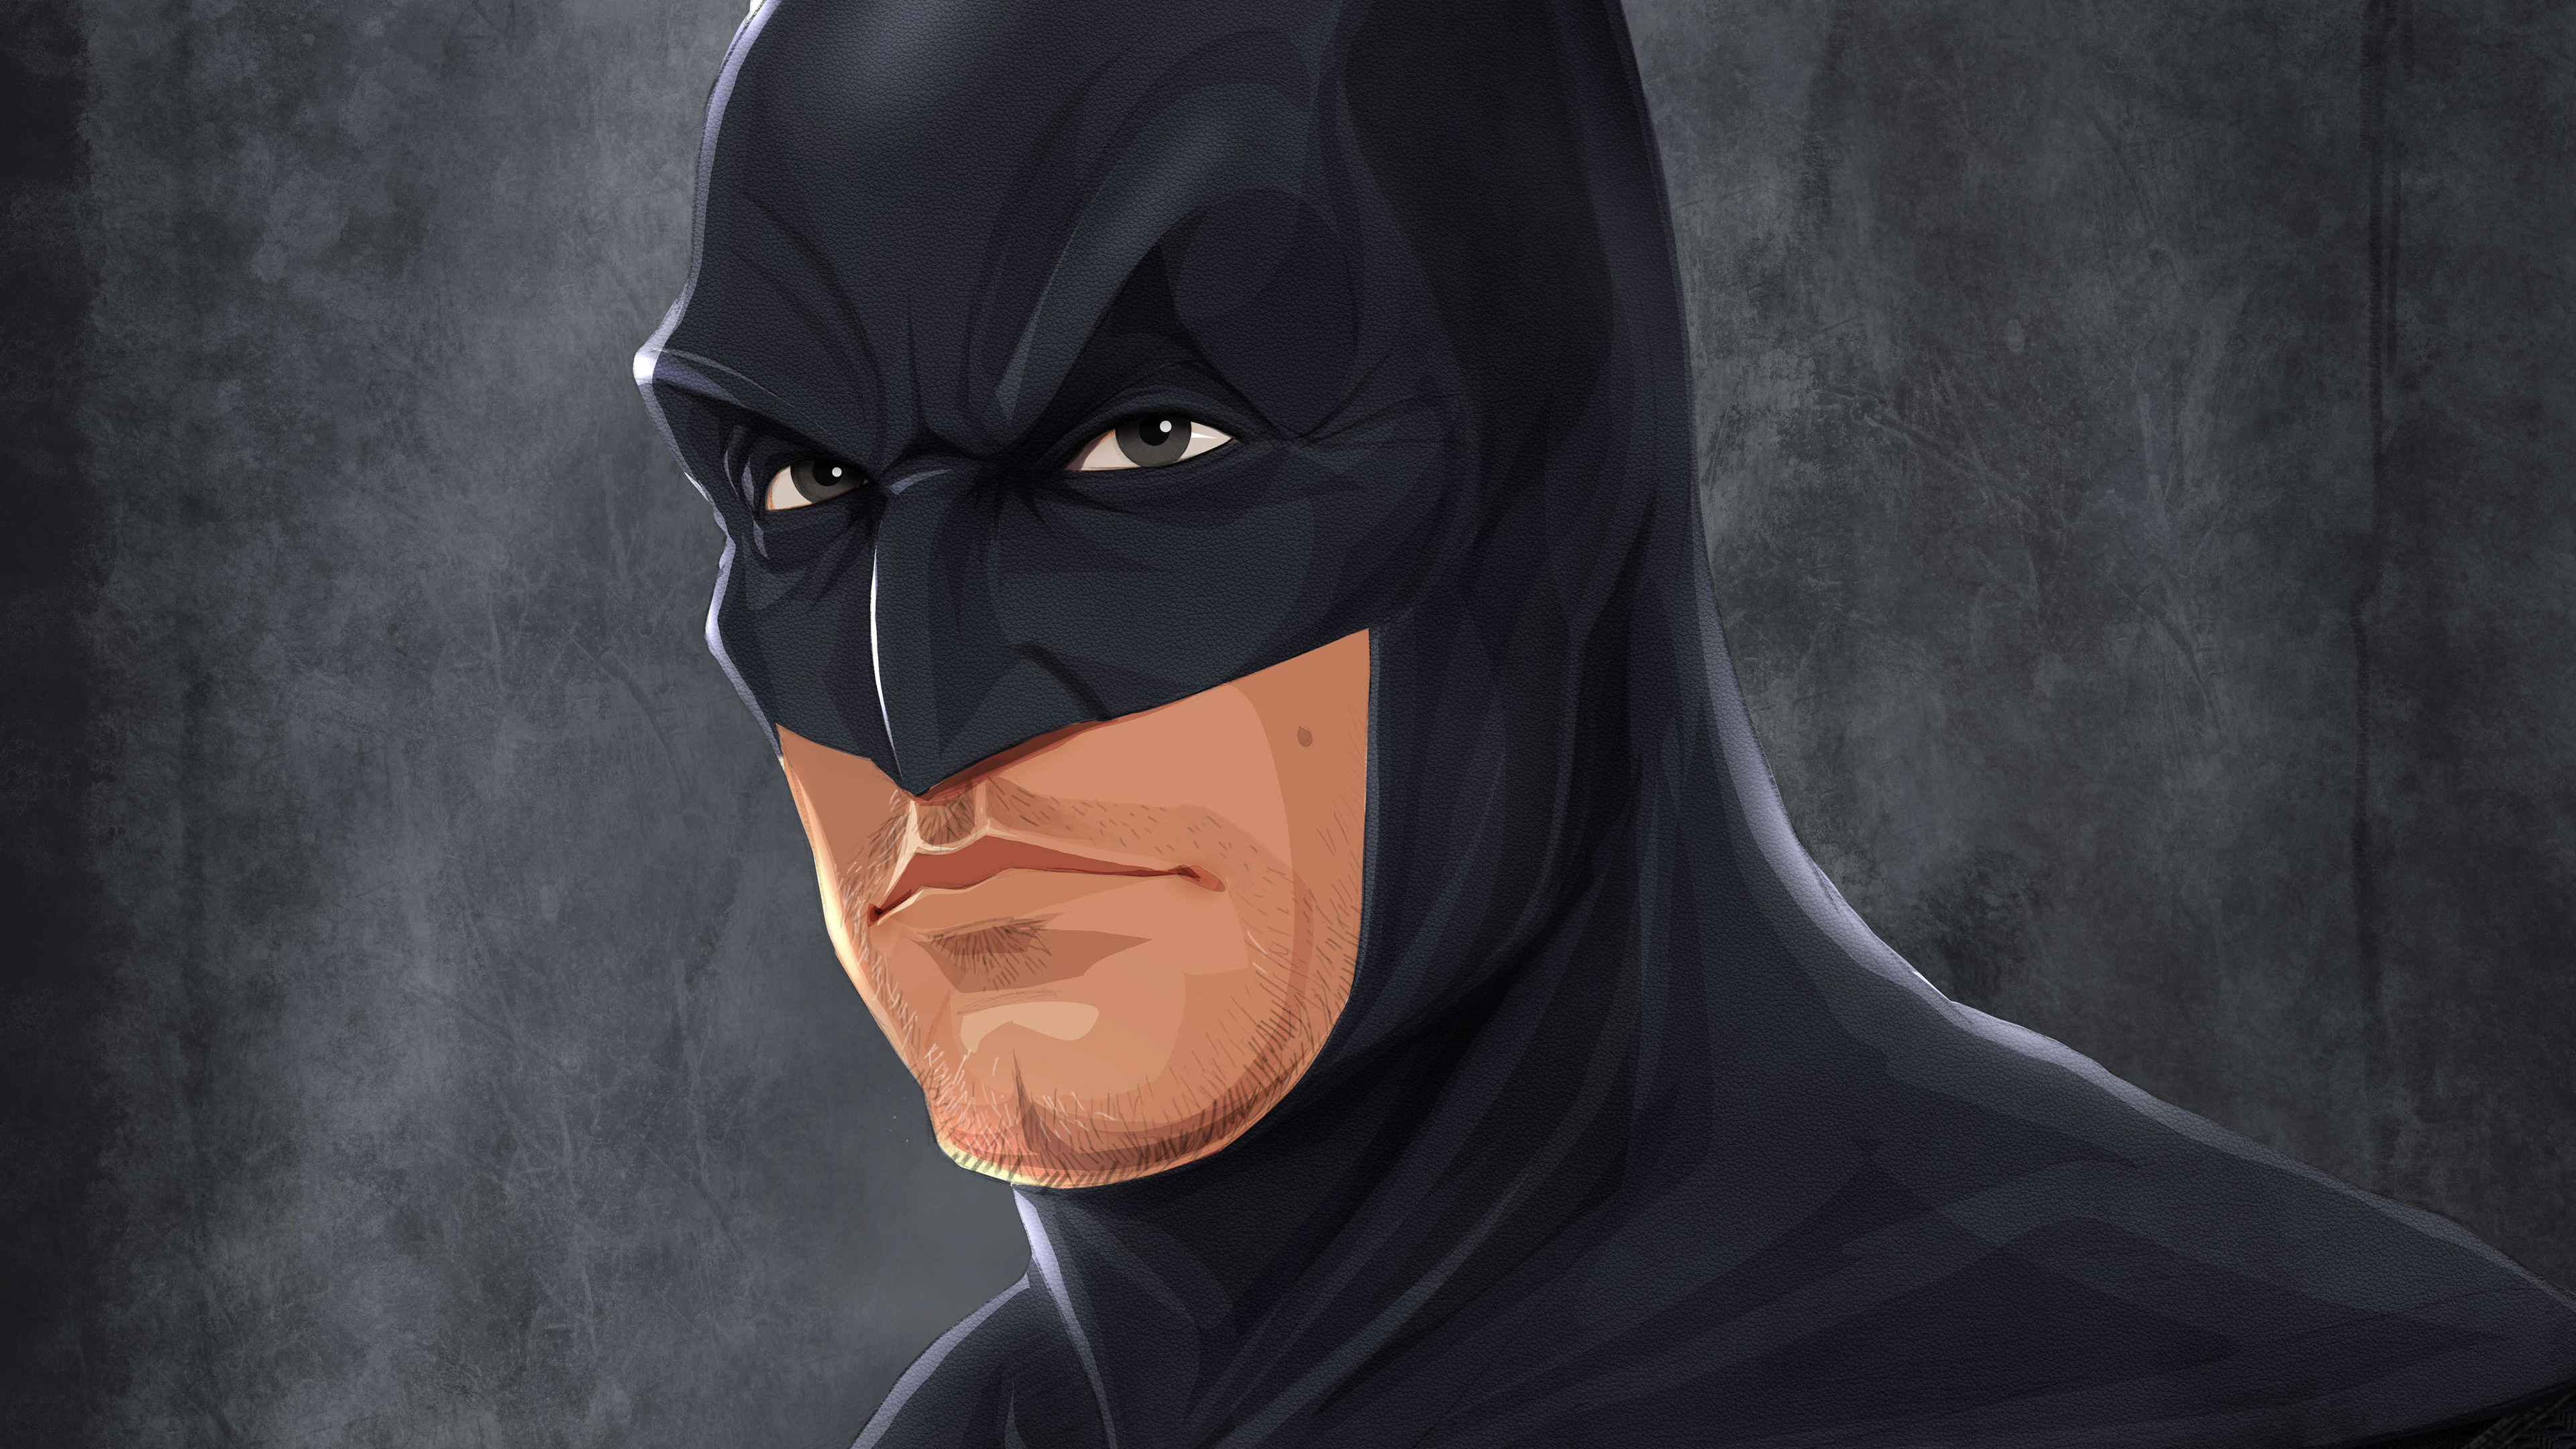 batman illustration 4k 1544286785 - Batman Illustration 4k - superheroes wallpapers, hd-wallpapers, behance wallpapers, batman wallpapers, artwork wallpapers, artist wallpapers, 4k-wallpapers